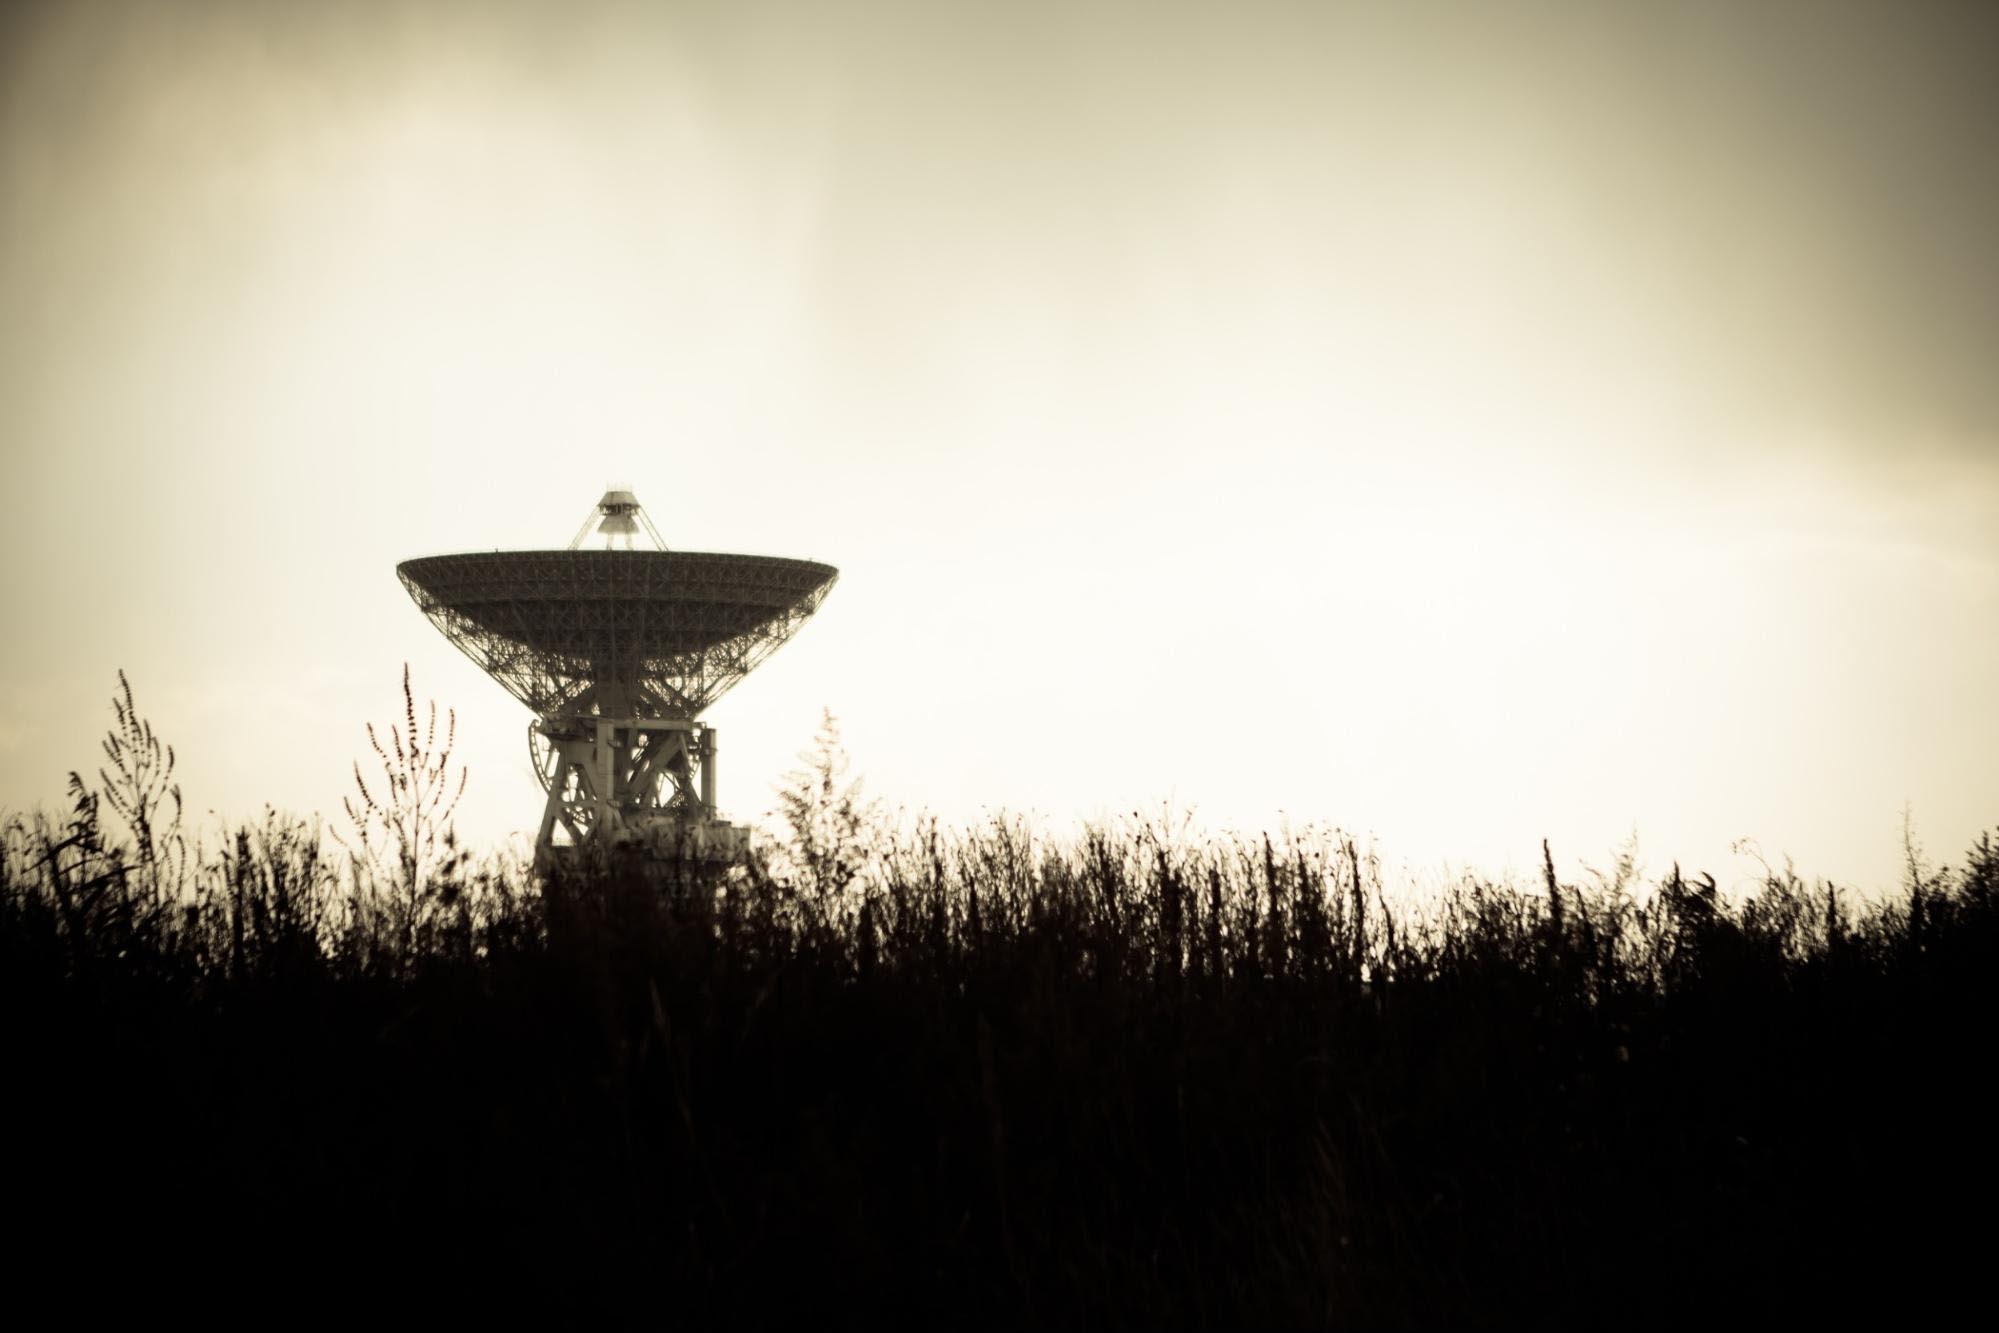 SETI satellite dish